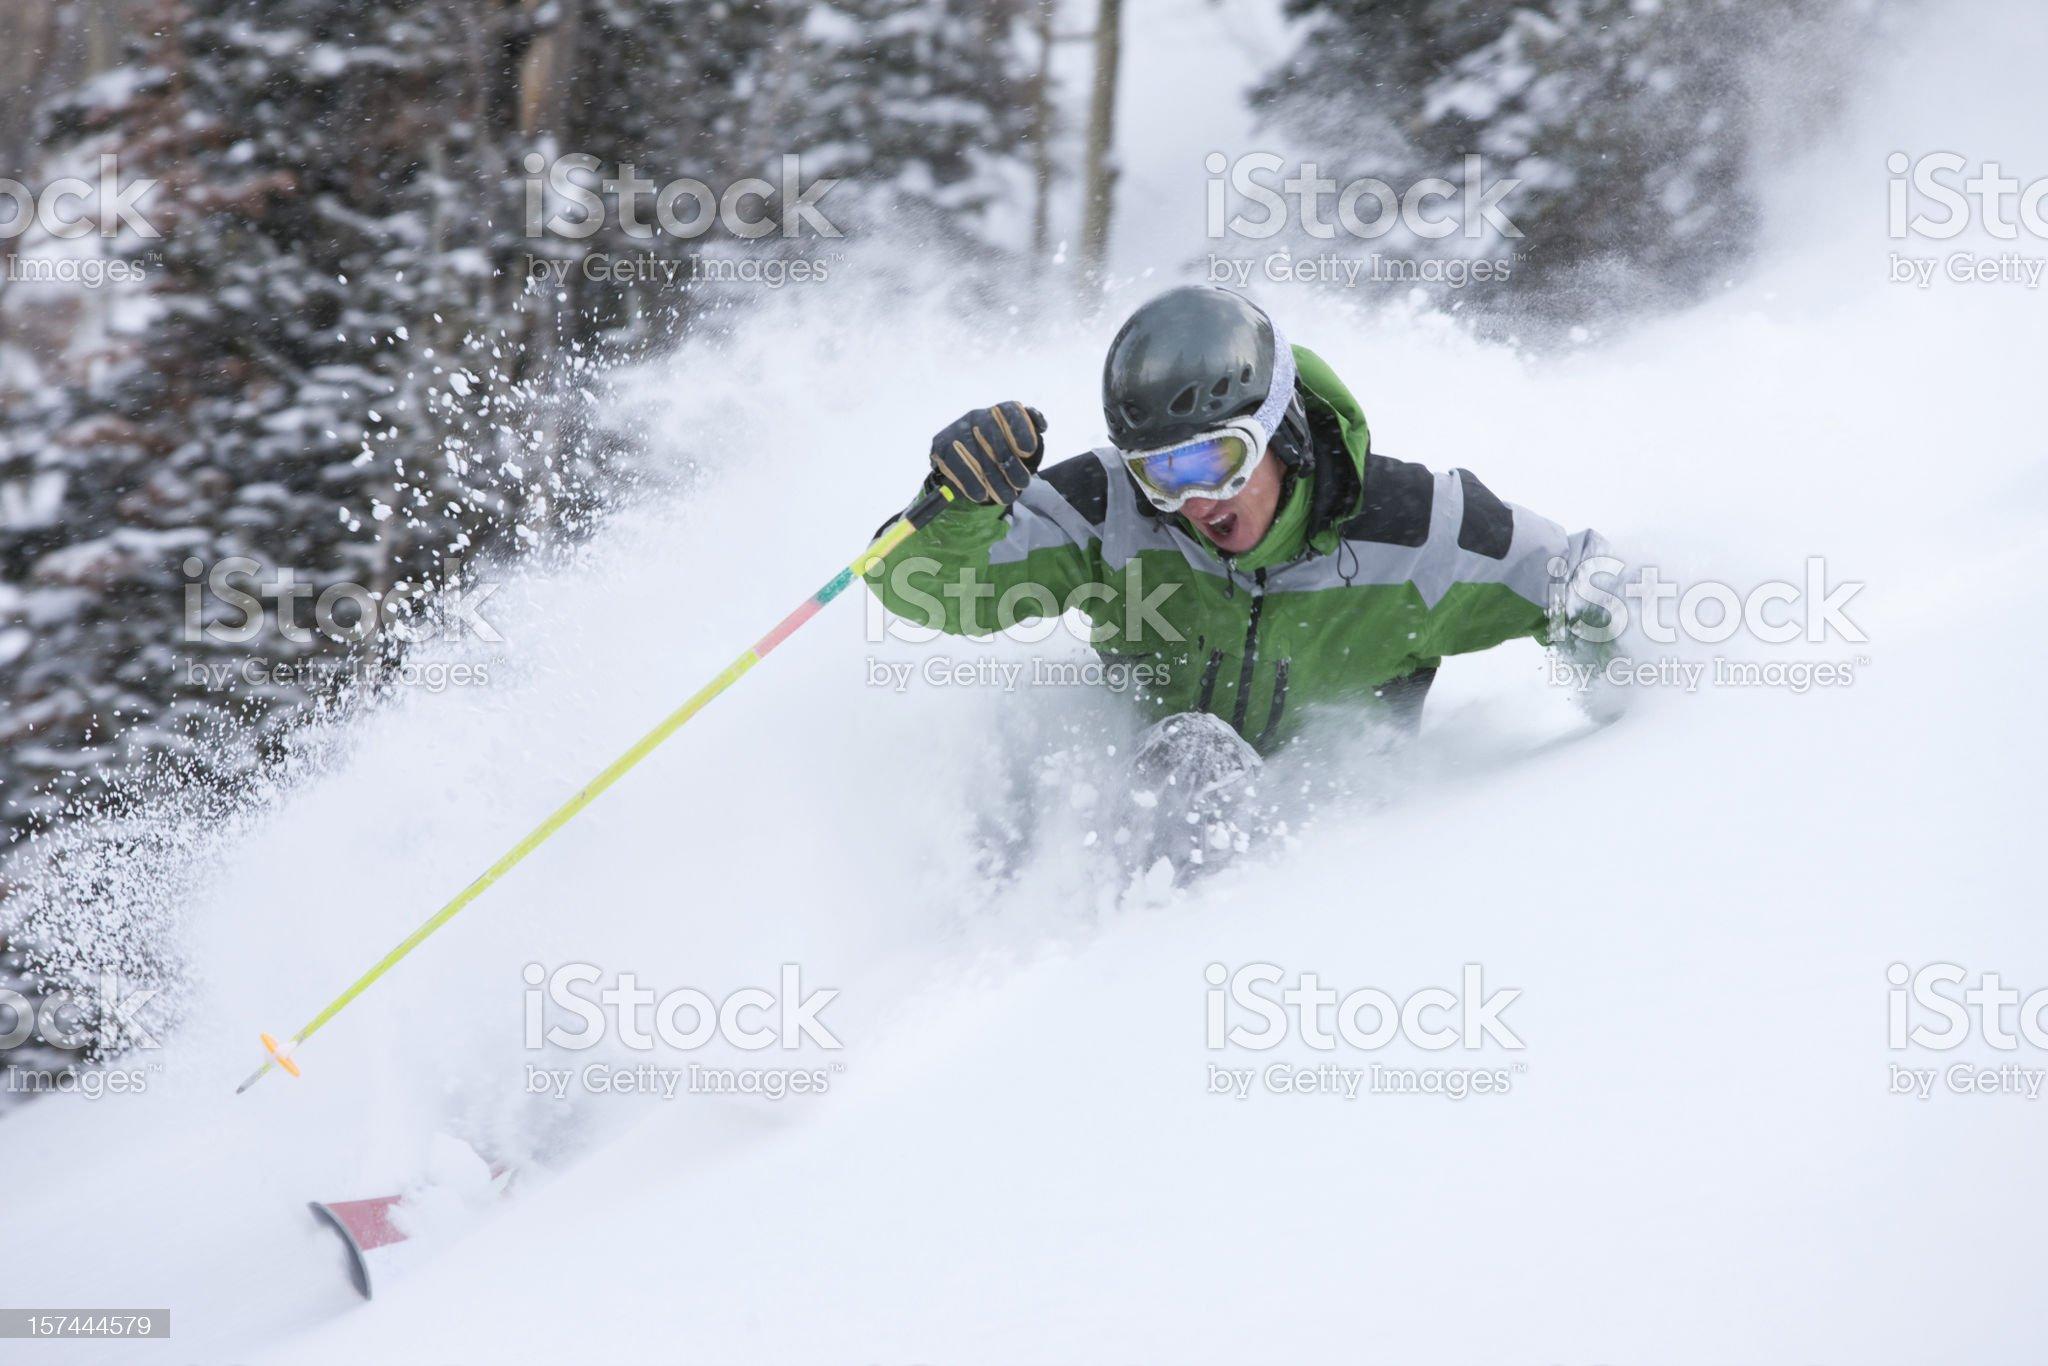 Skiing action royalty-free stock photo